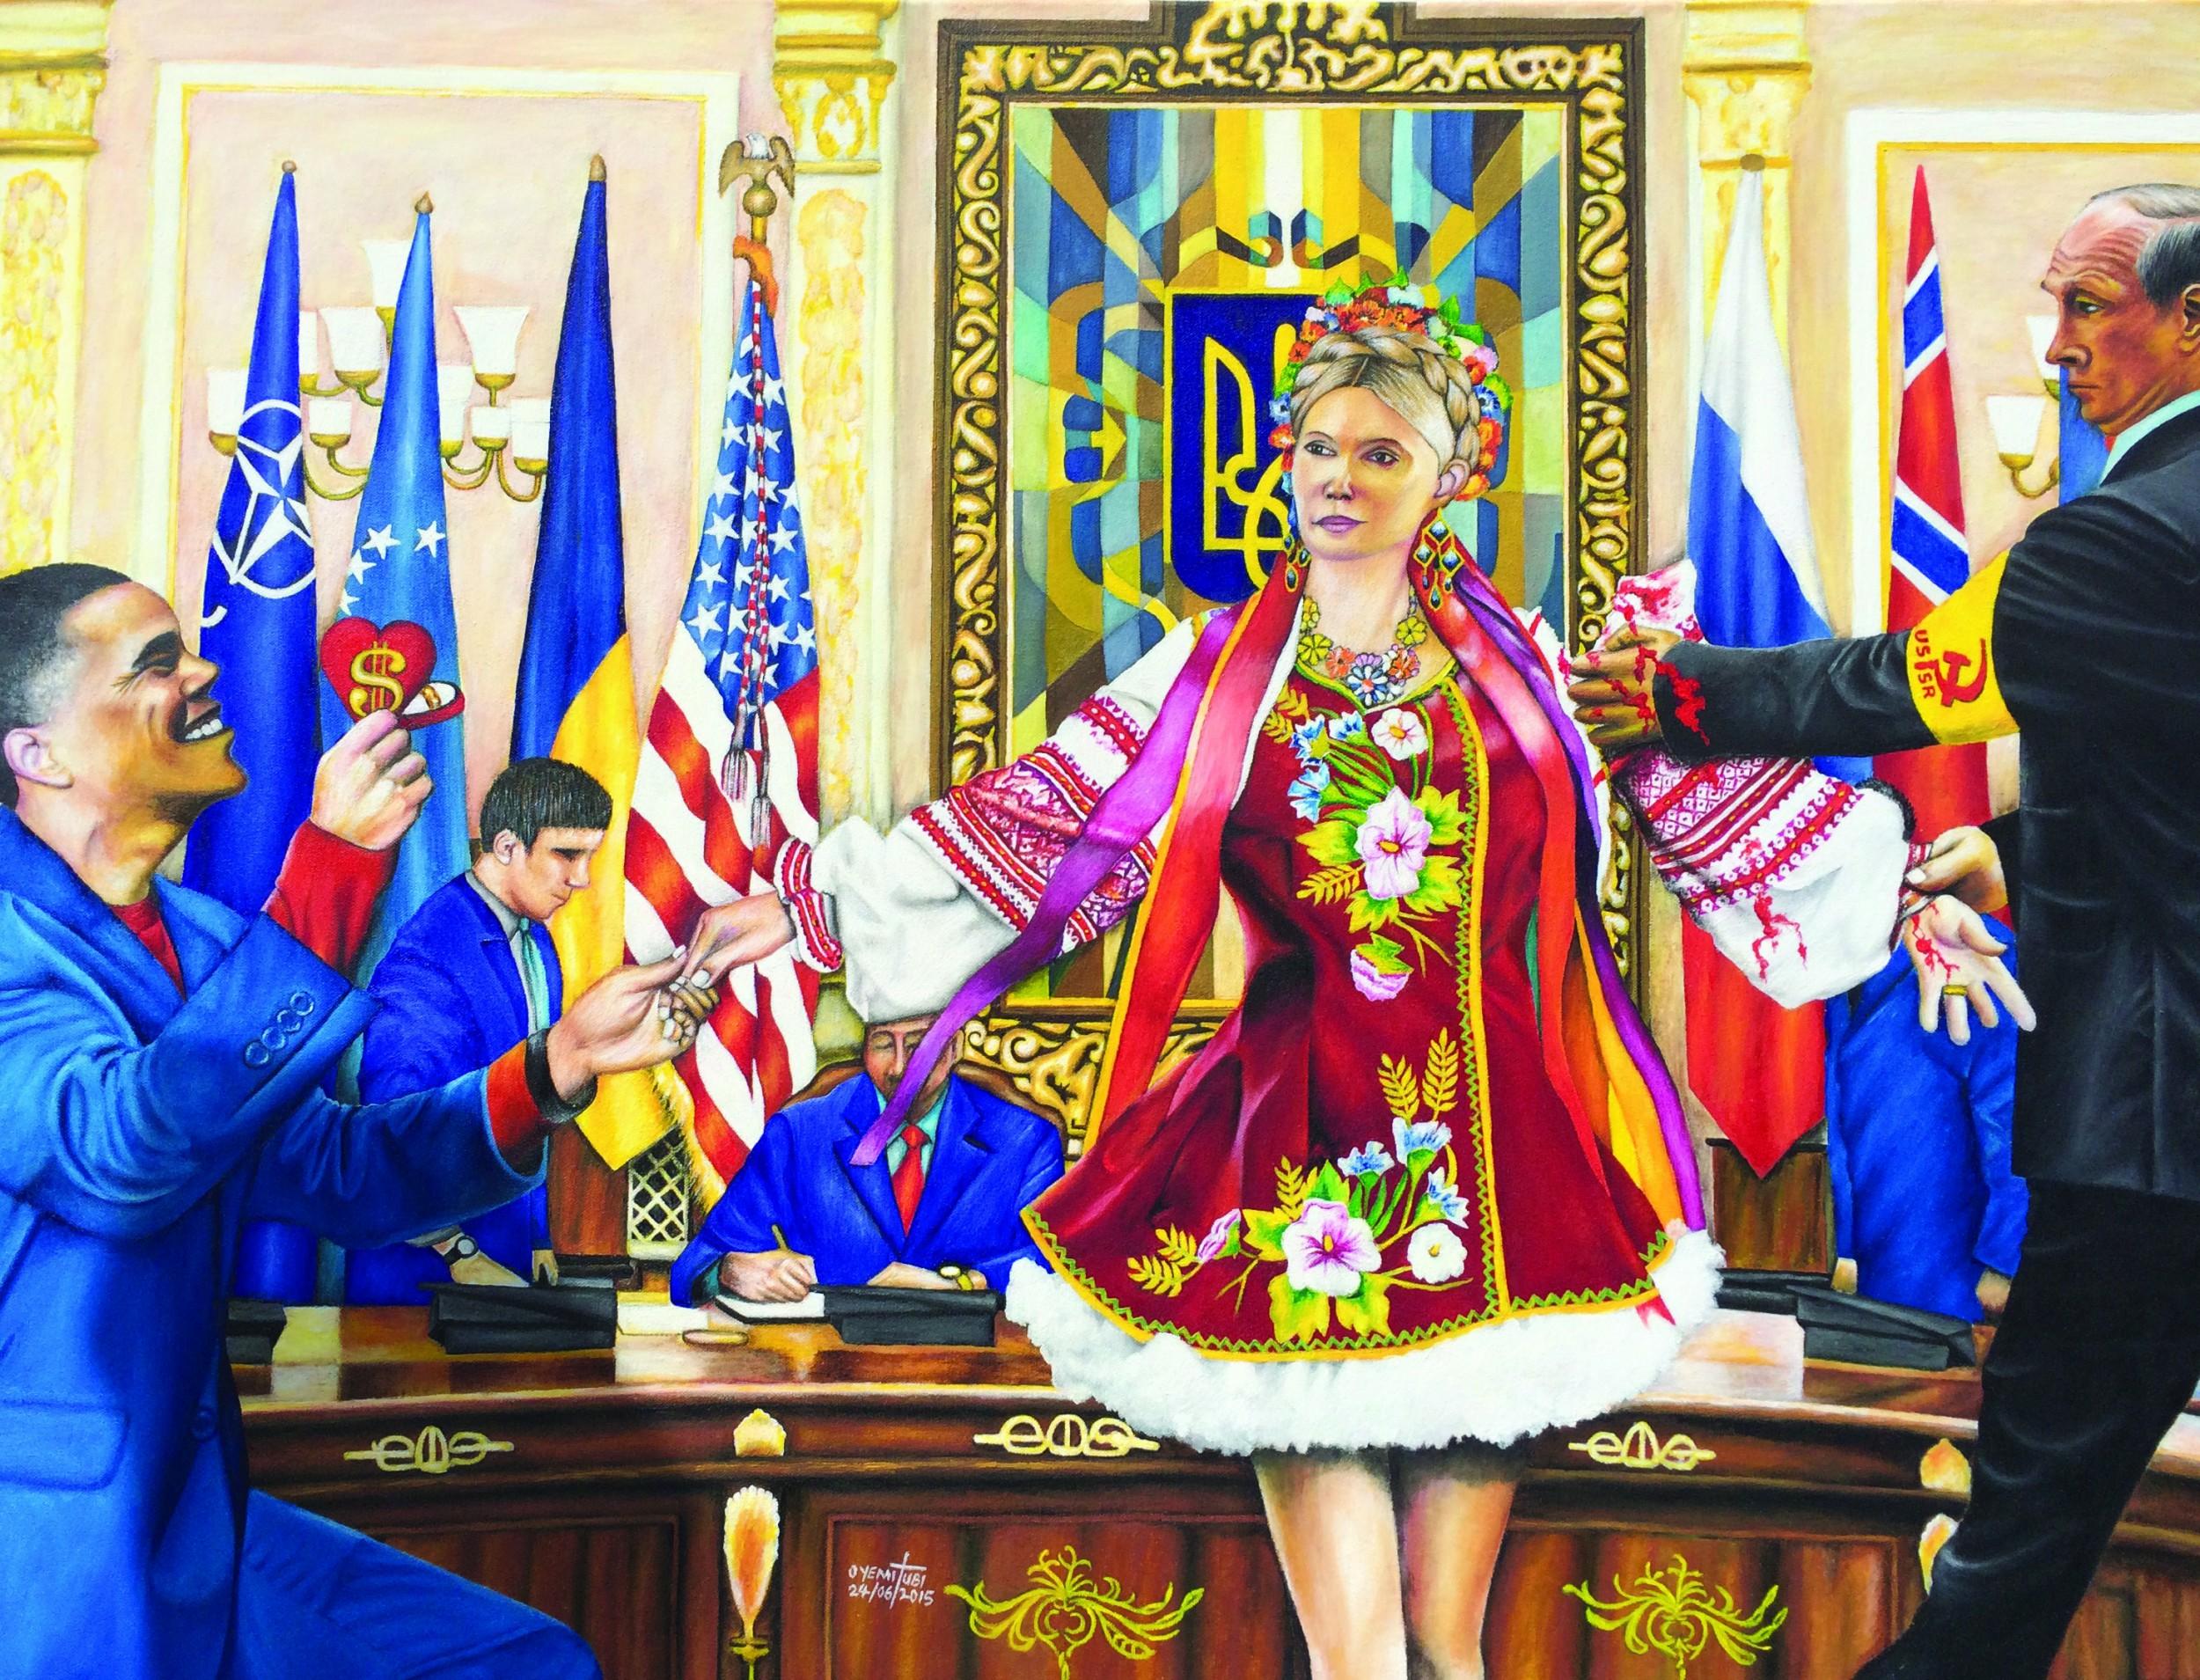 Russian Bride In The Unfortunate 60